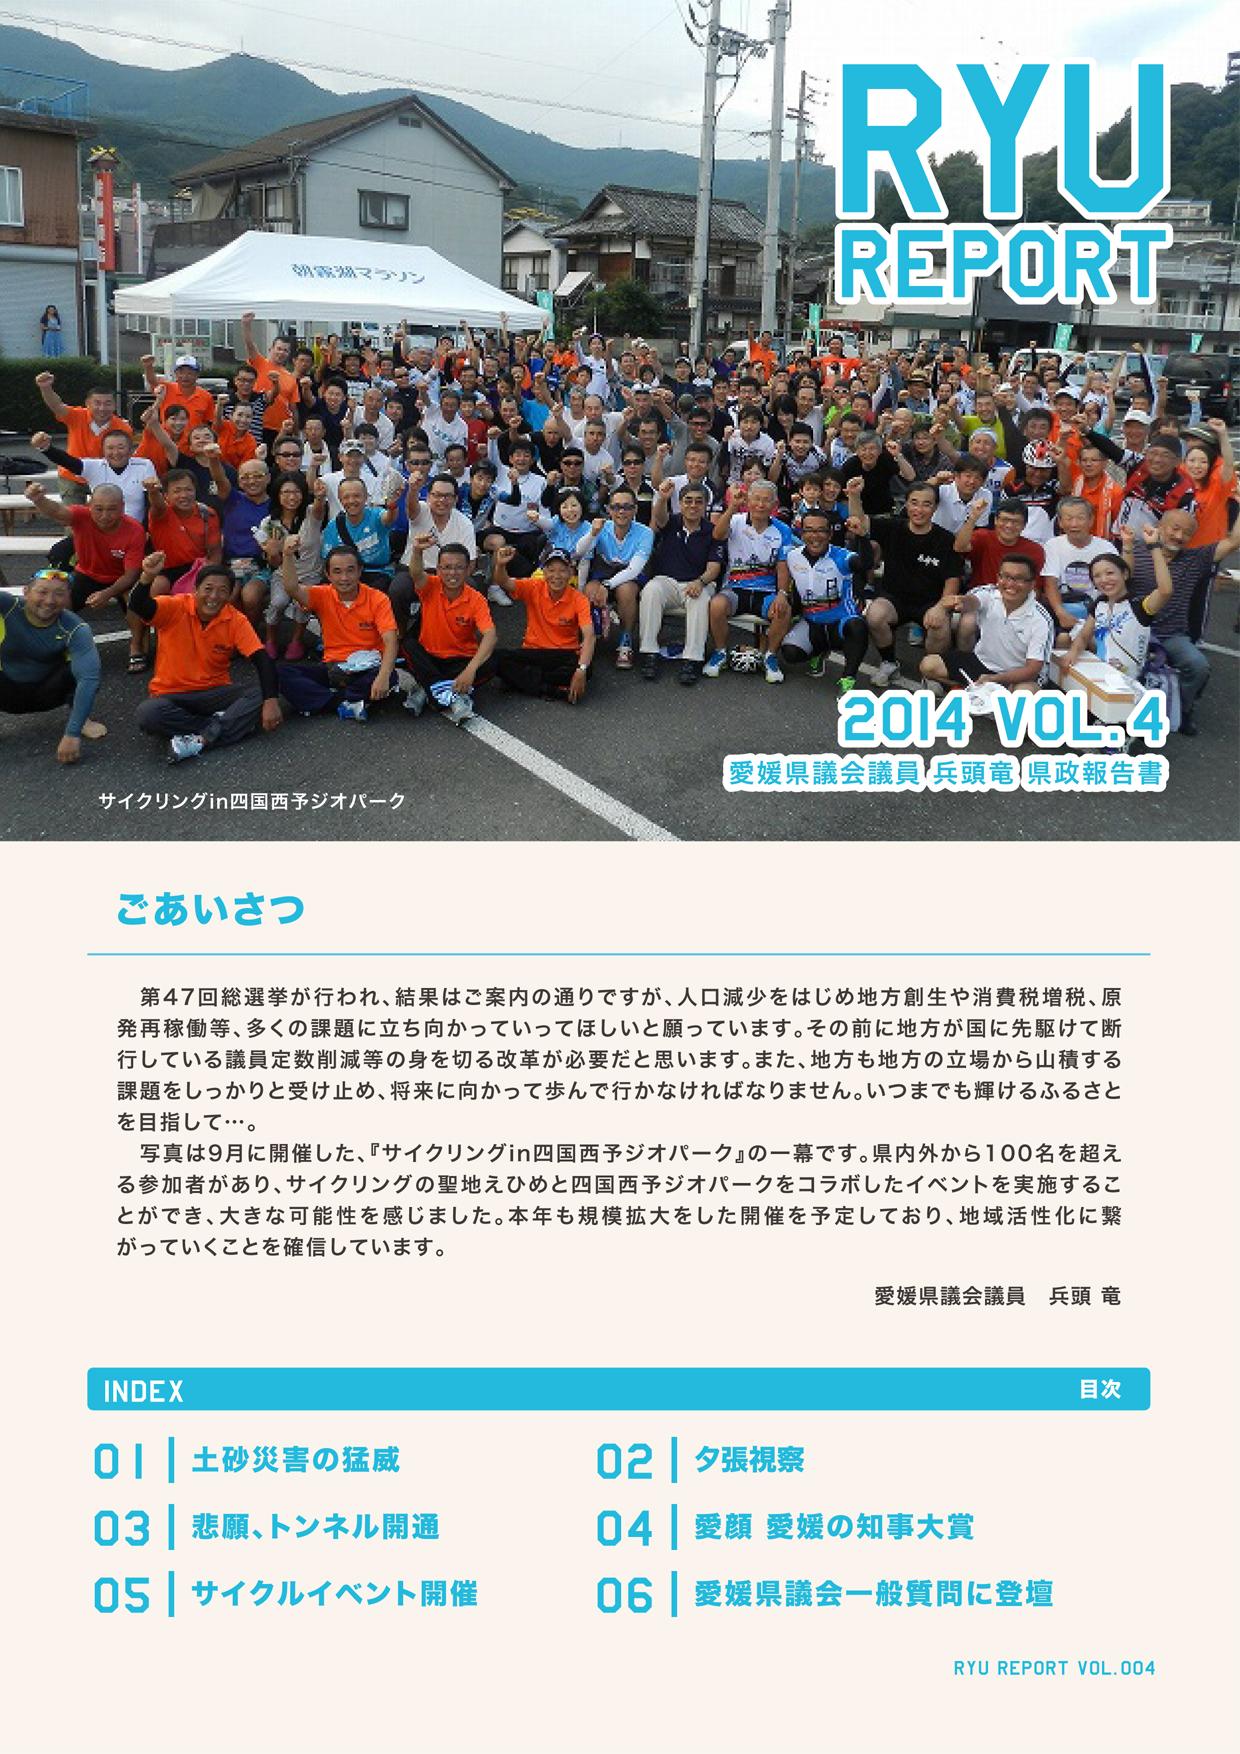 RYU REPORT -県政報告書- vol.4